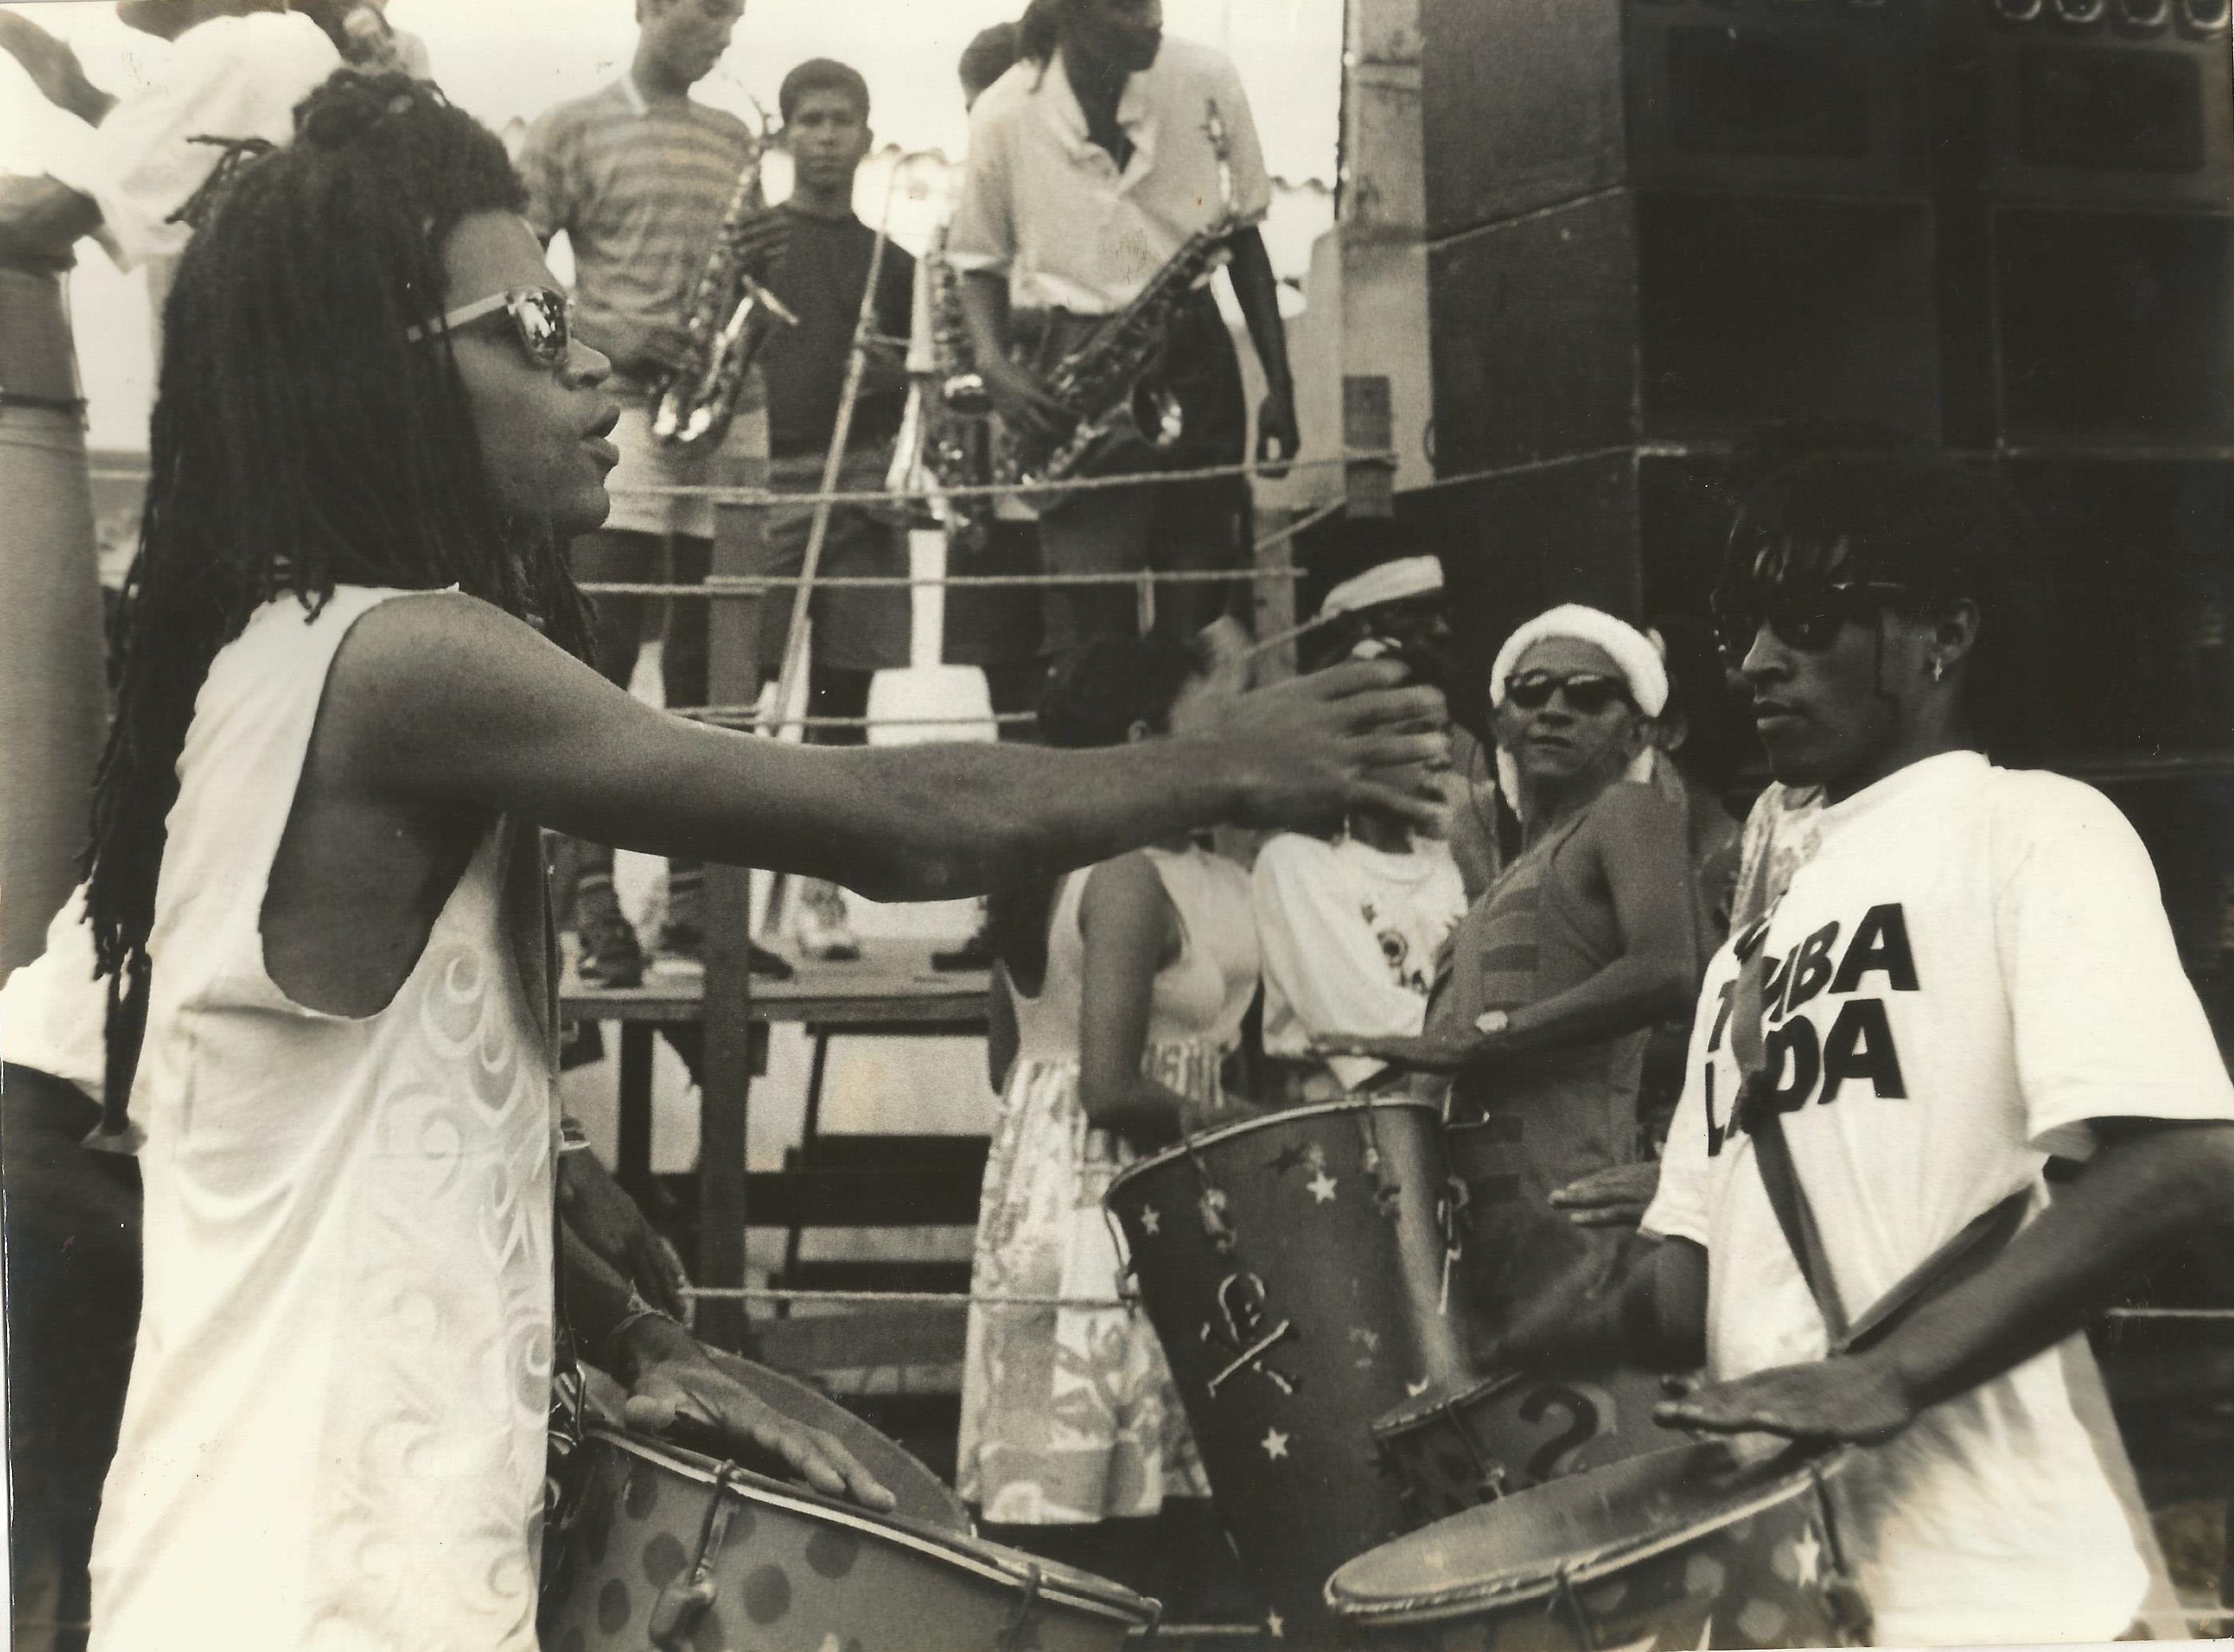 1991 – Fundaçao da Timbalada – Carlinhos Brown – Ensaio da Timbalada – Candeal